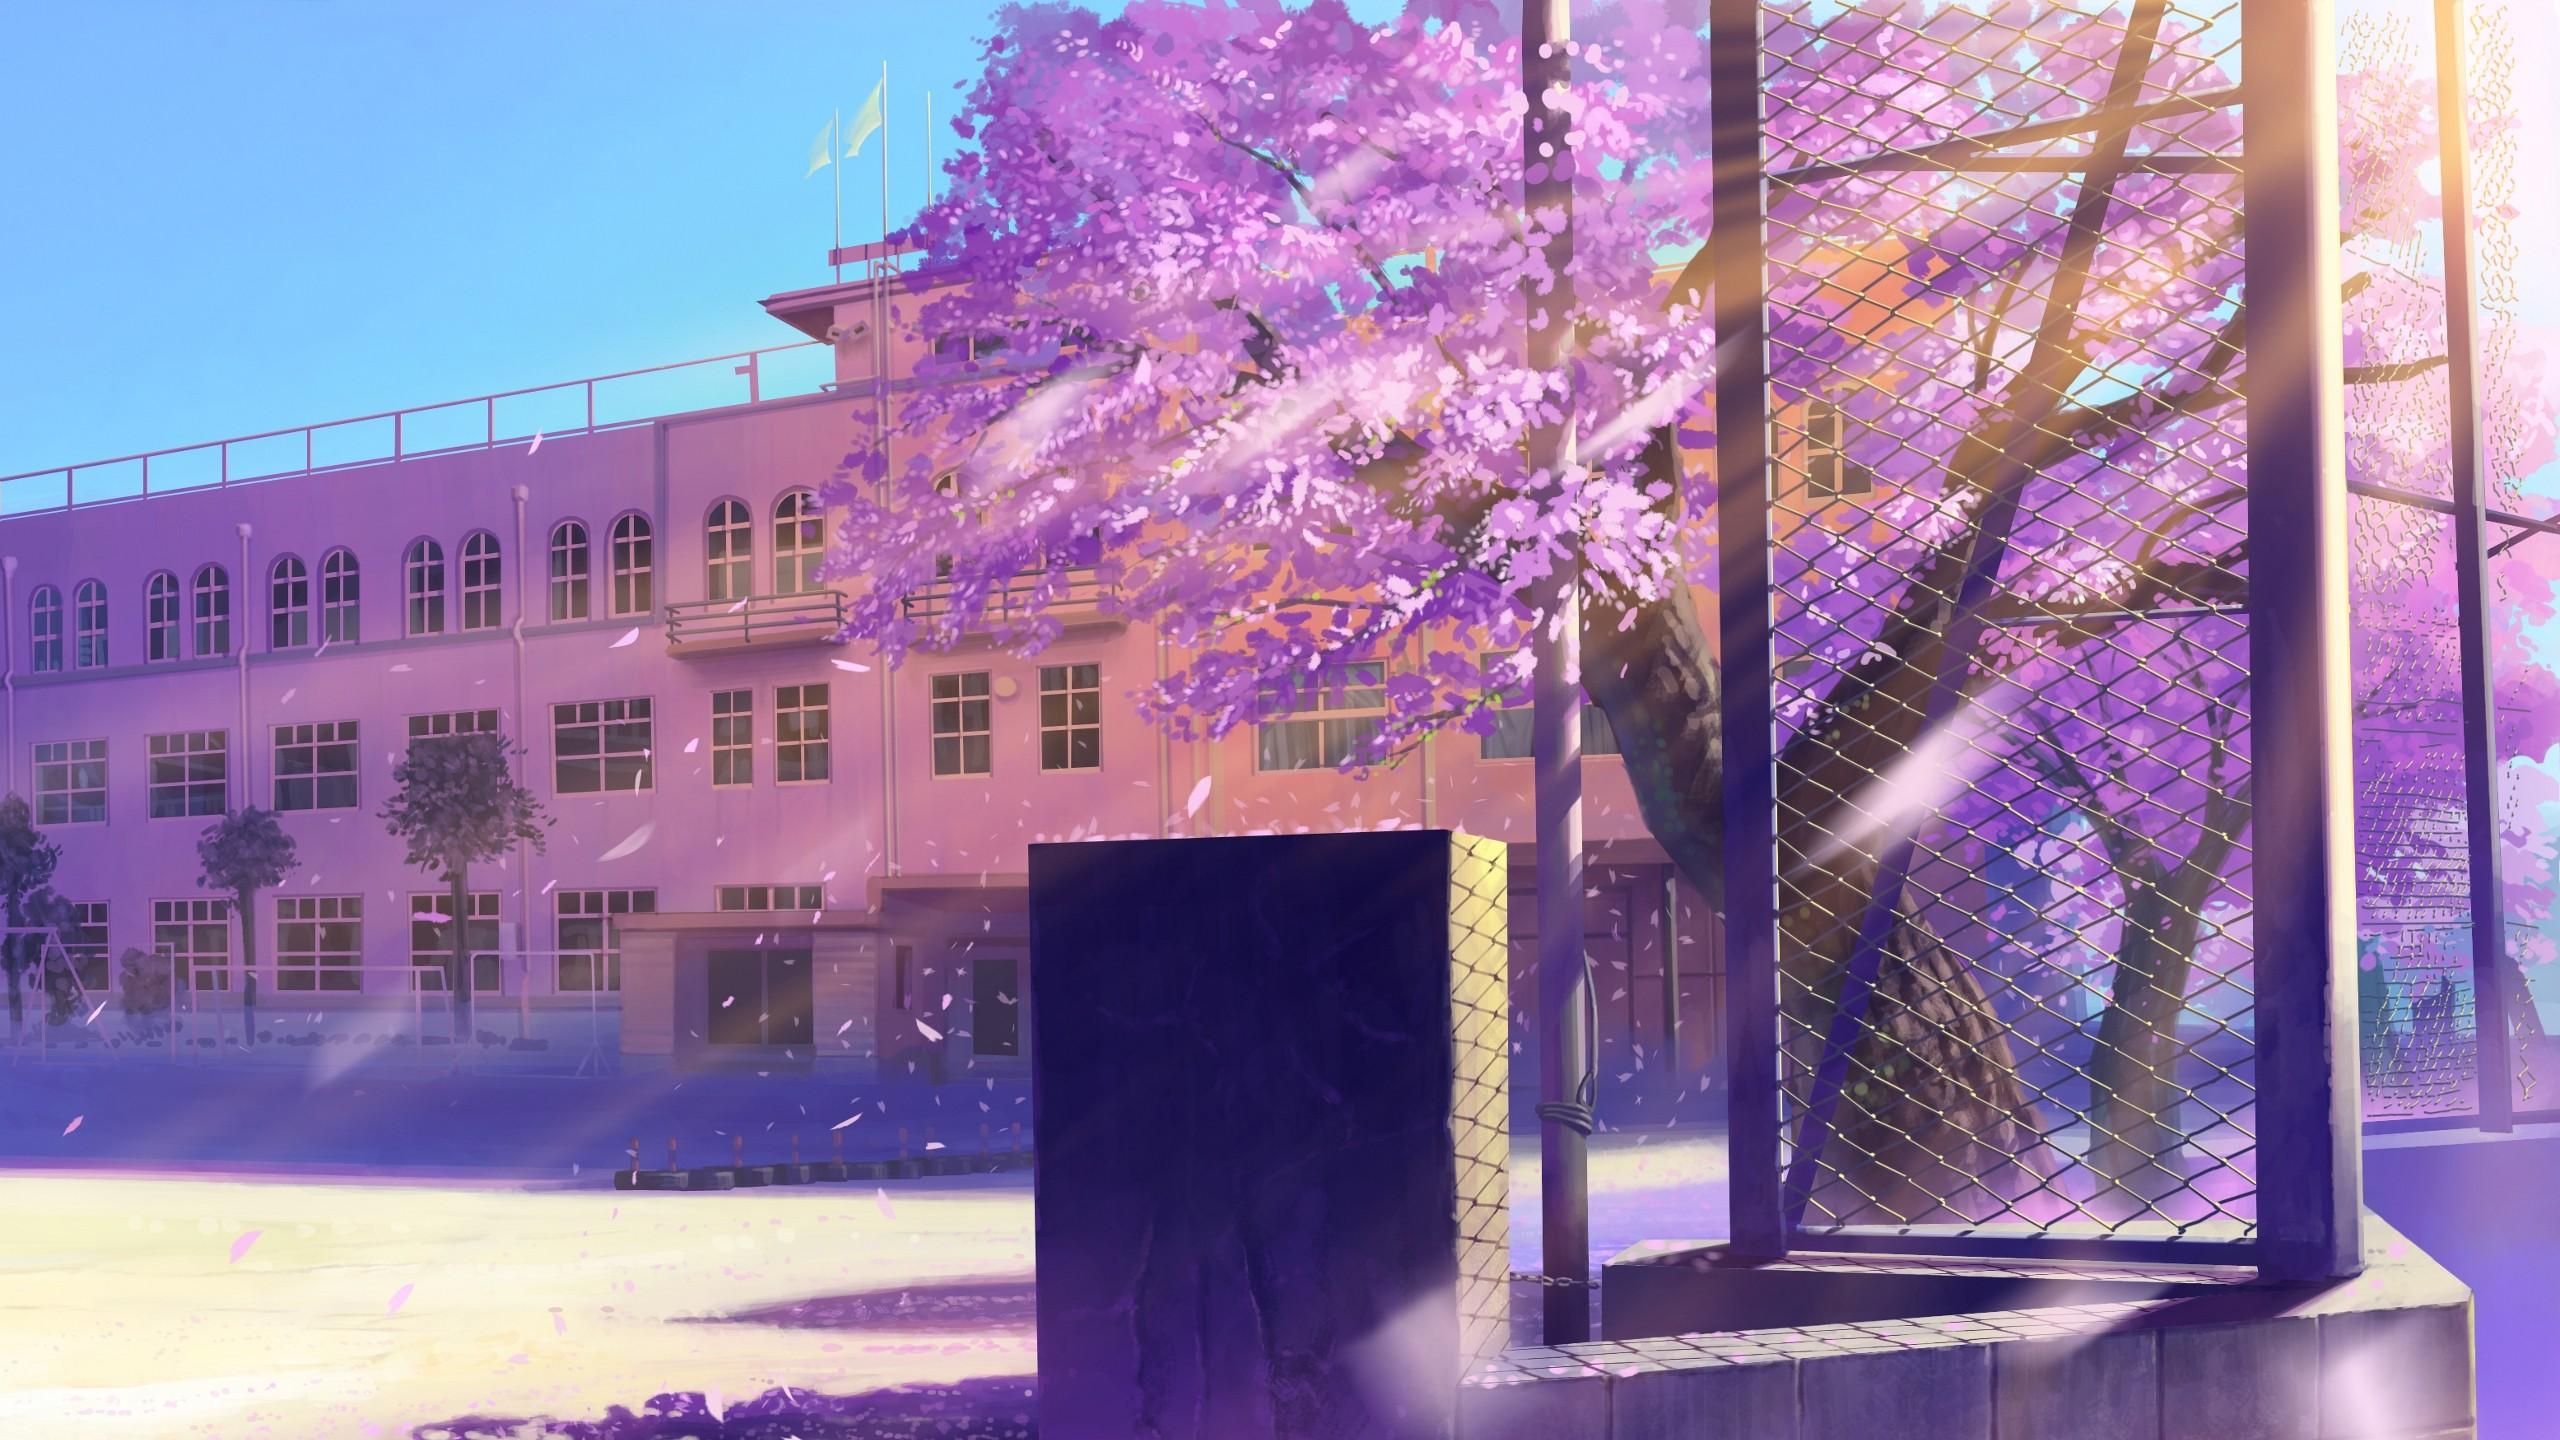 X X Wallpaper Anime School Winter Street